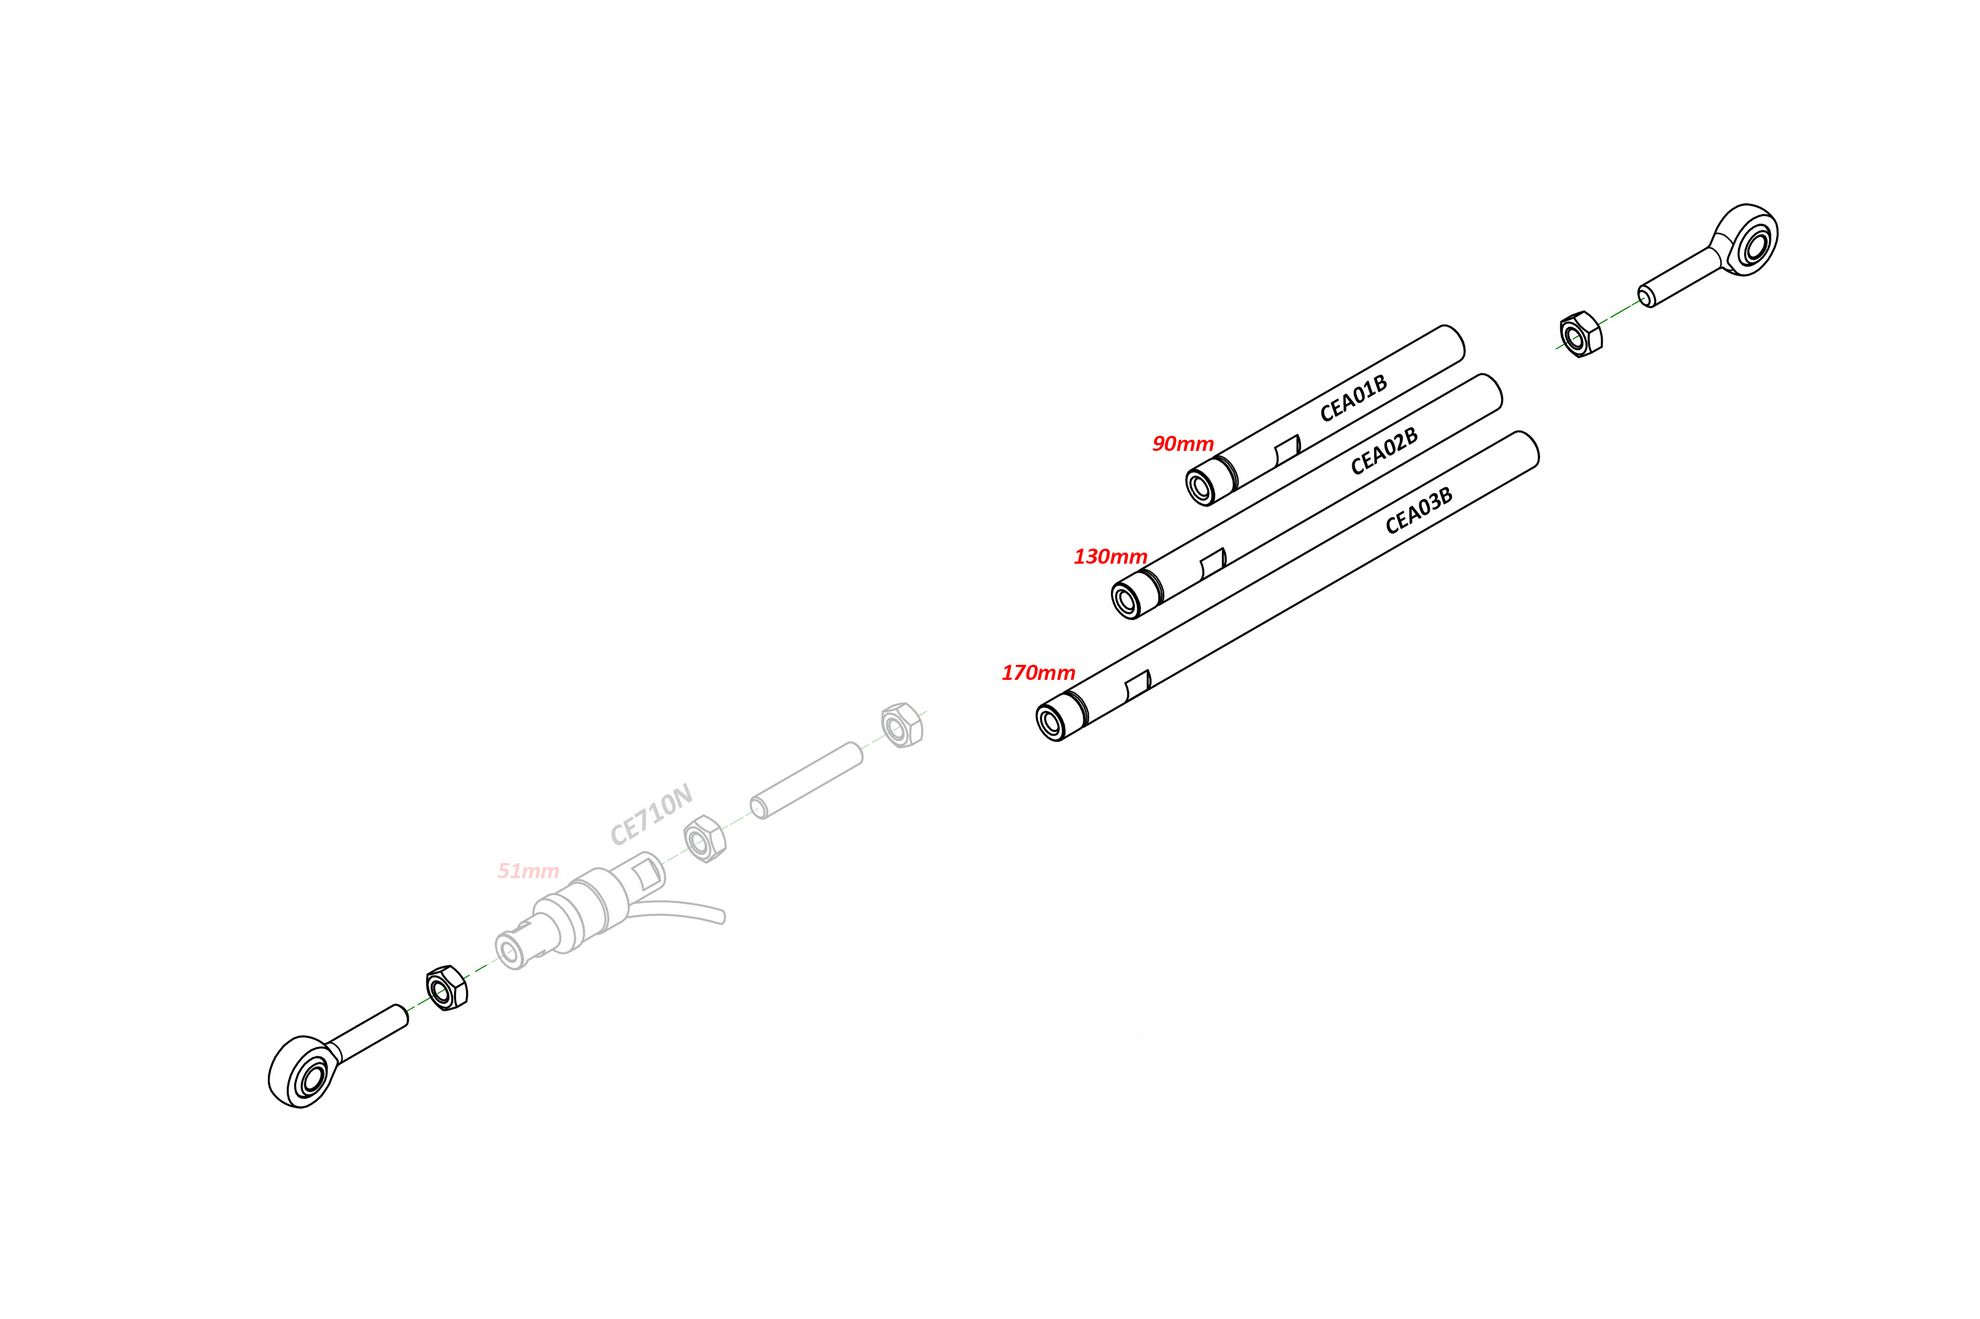 Universal Power Shifter Cnc Racing Wiring Diagram Bmw S1000rr Ducati Multistrada 1200